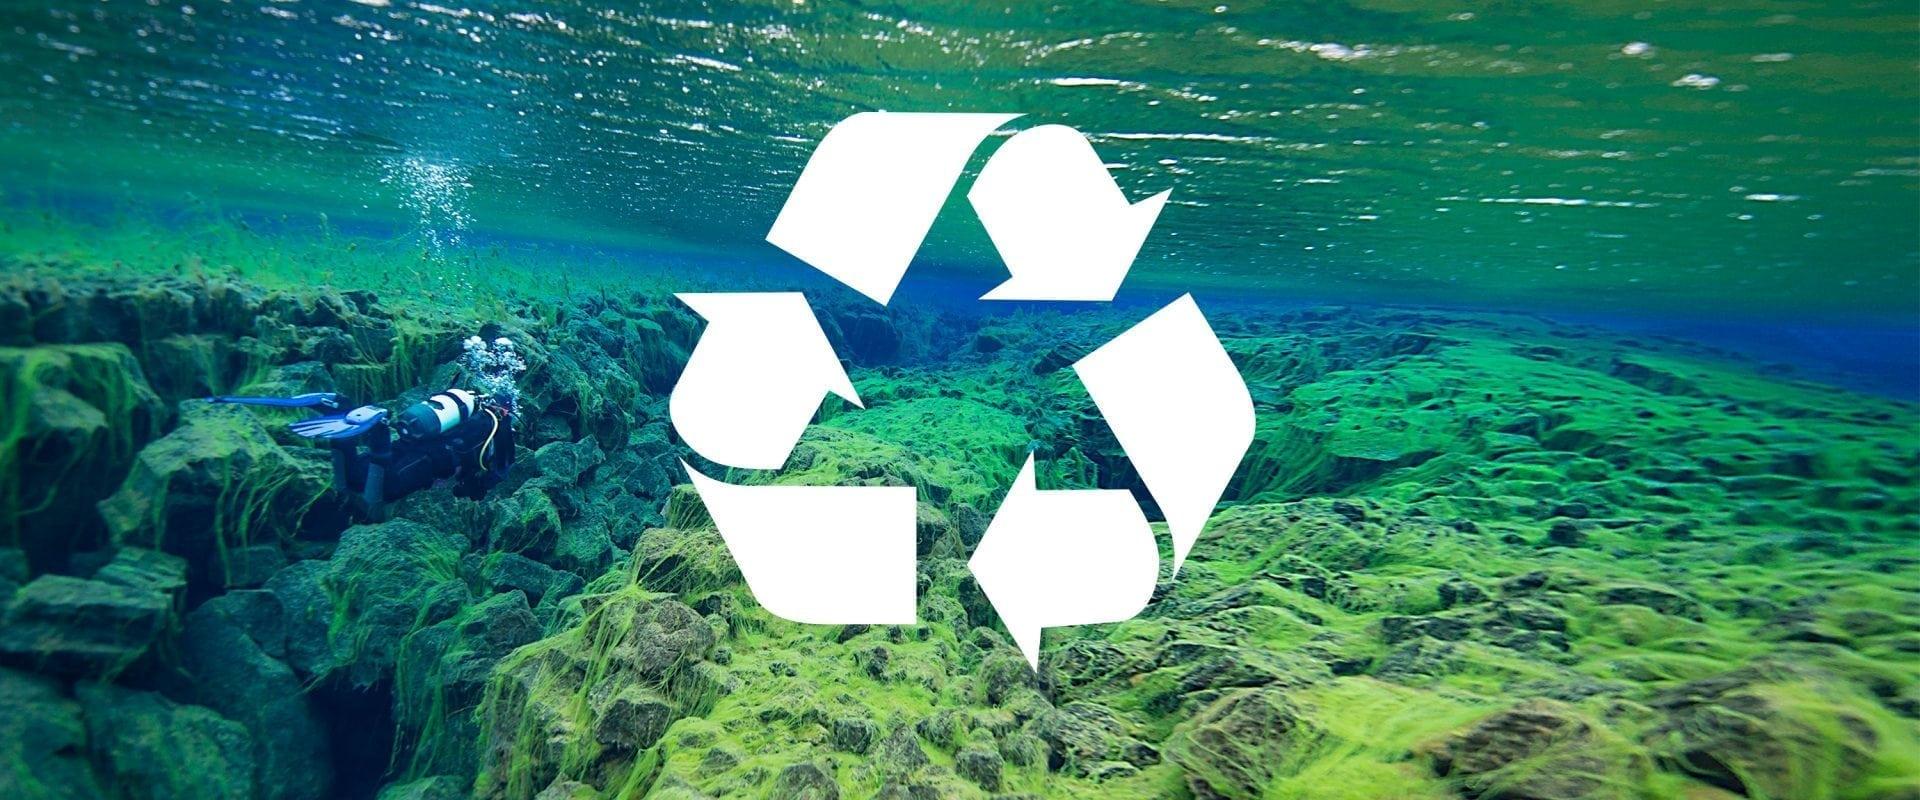 recycled fabrics: nylon fabrics in econyl